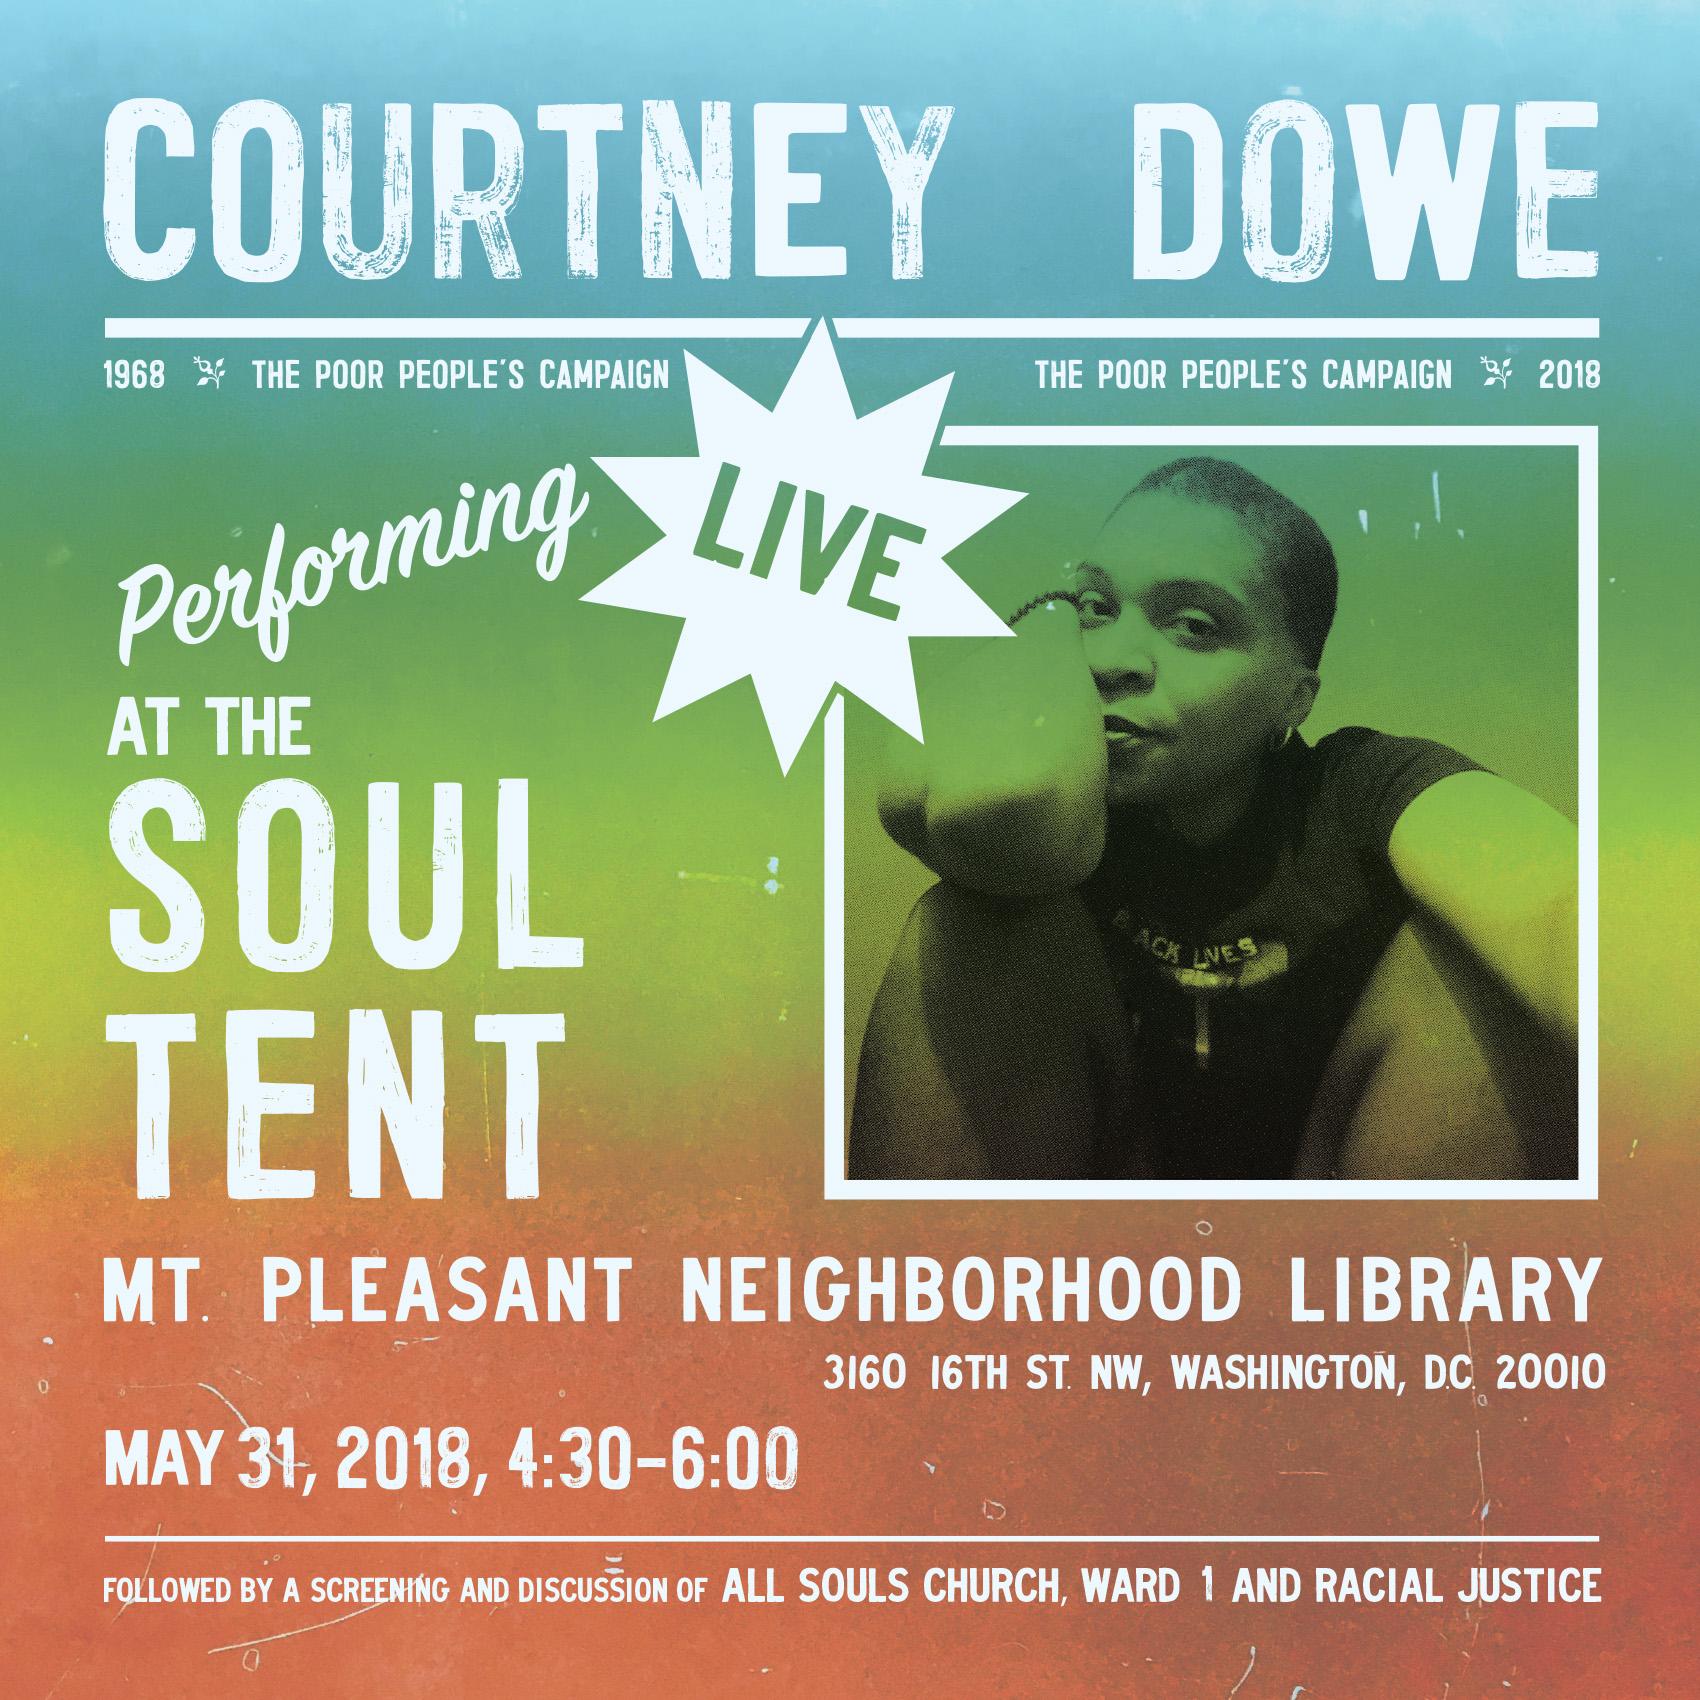 Flier for Courtney Dowe performance, 2018 (design by Joshua Gamma)